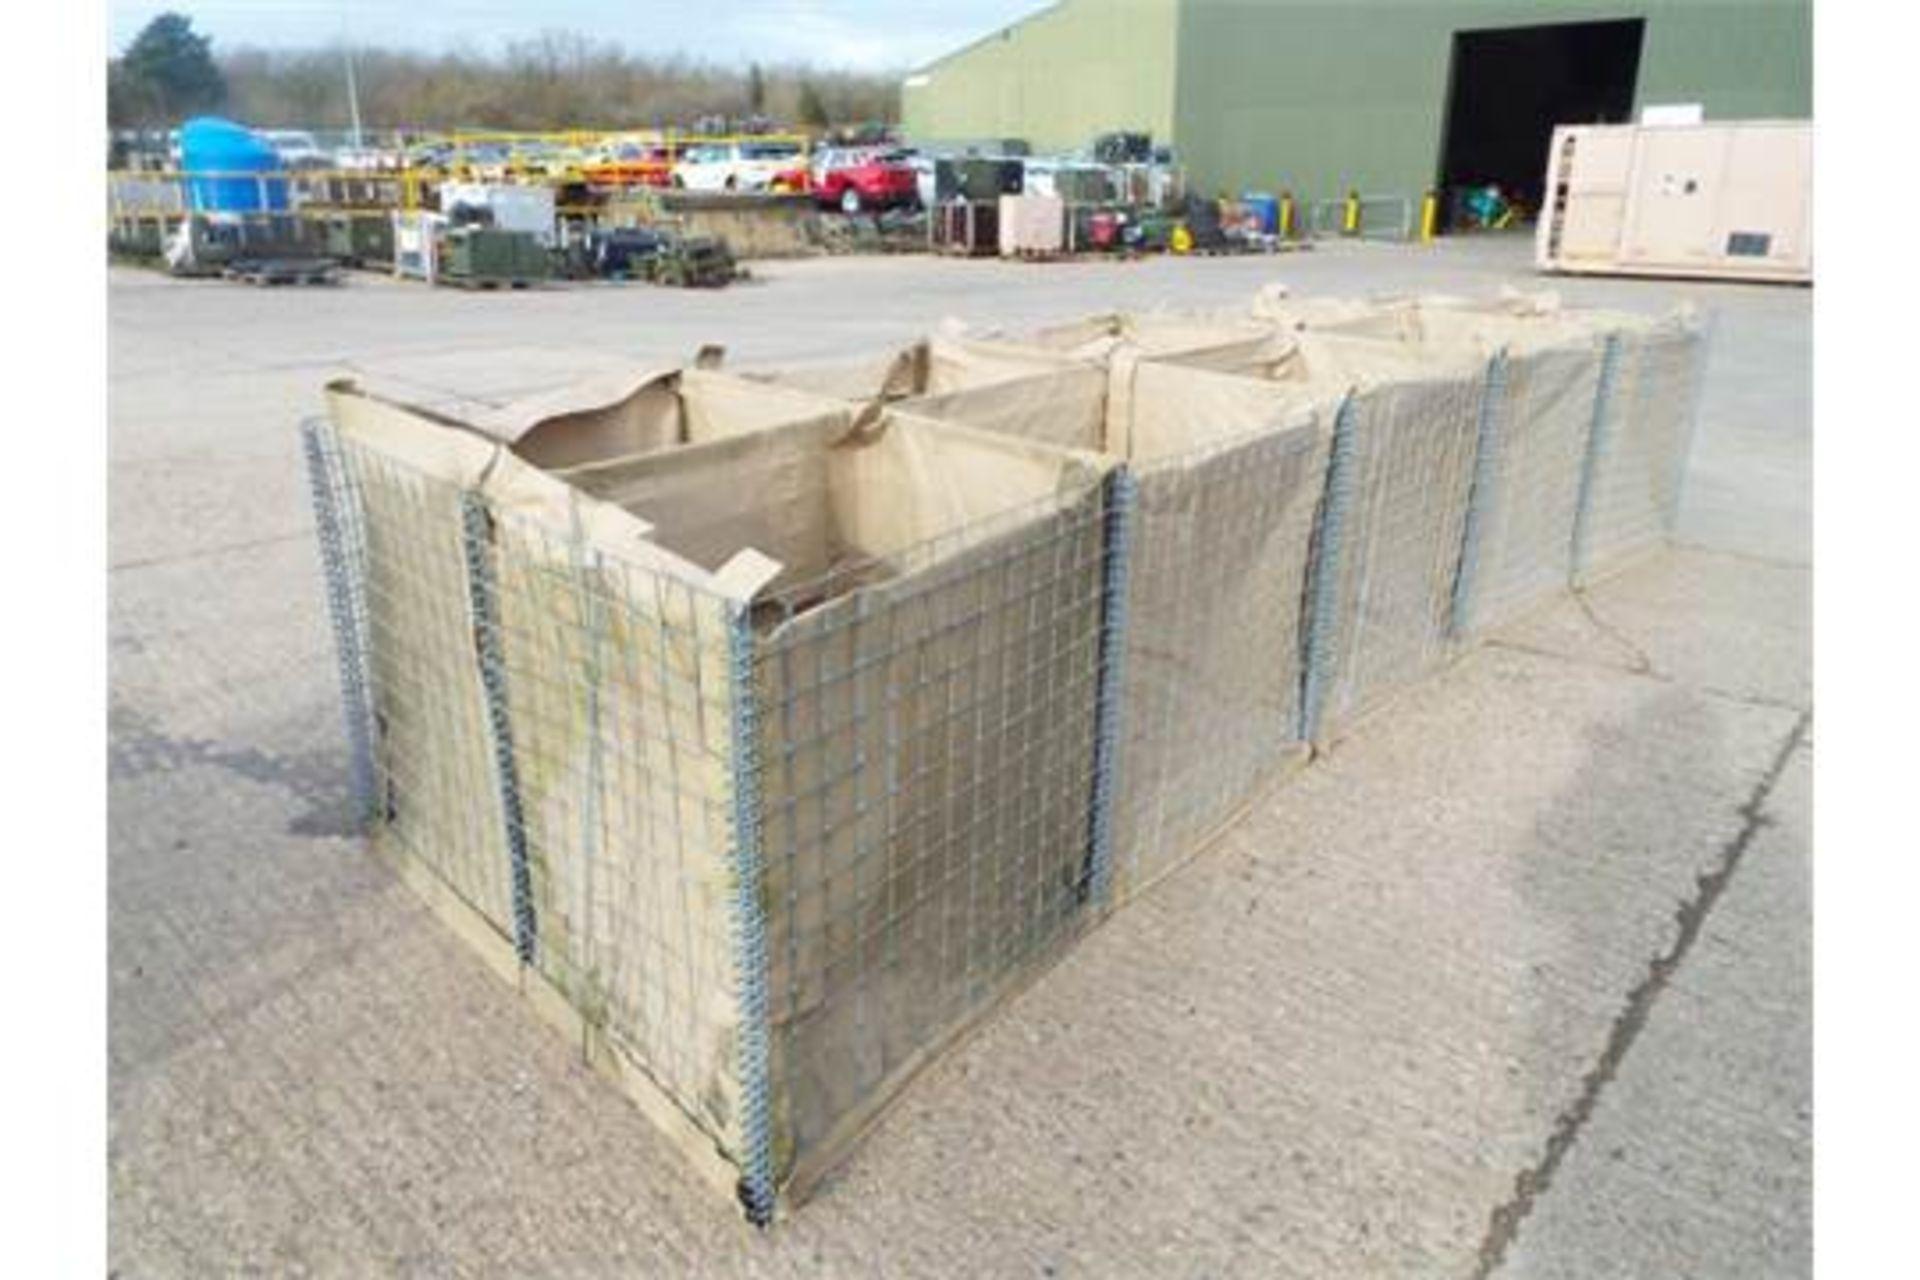 Lot 46 - 5m x 1.6m x 1m Hesco Mil 31311 10 Section Defensive Barrier